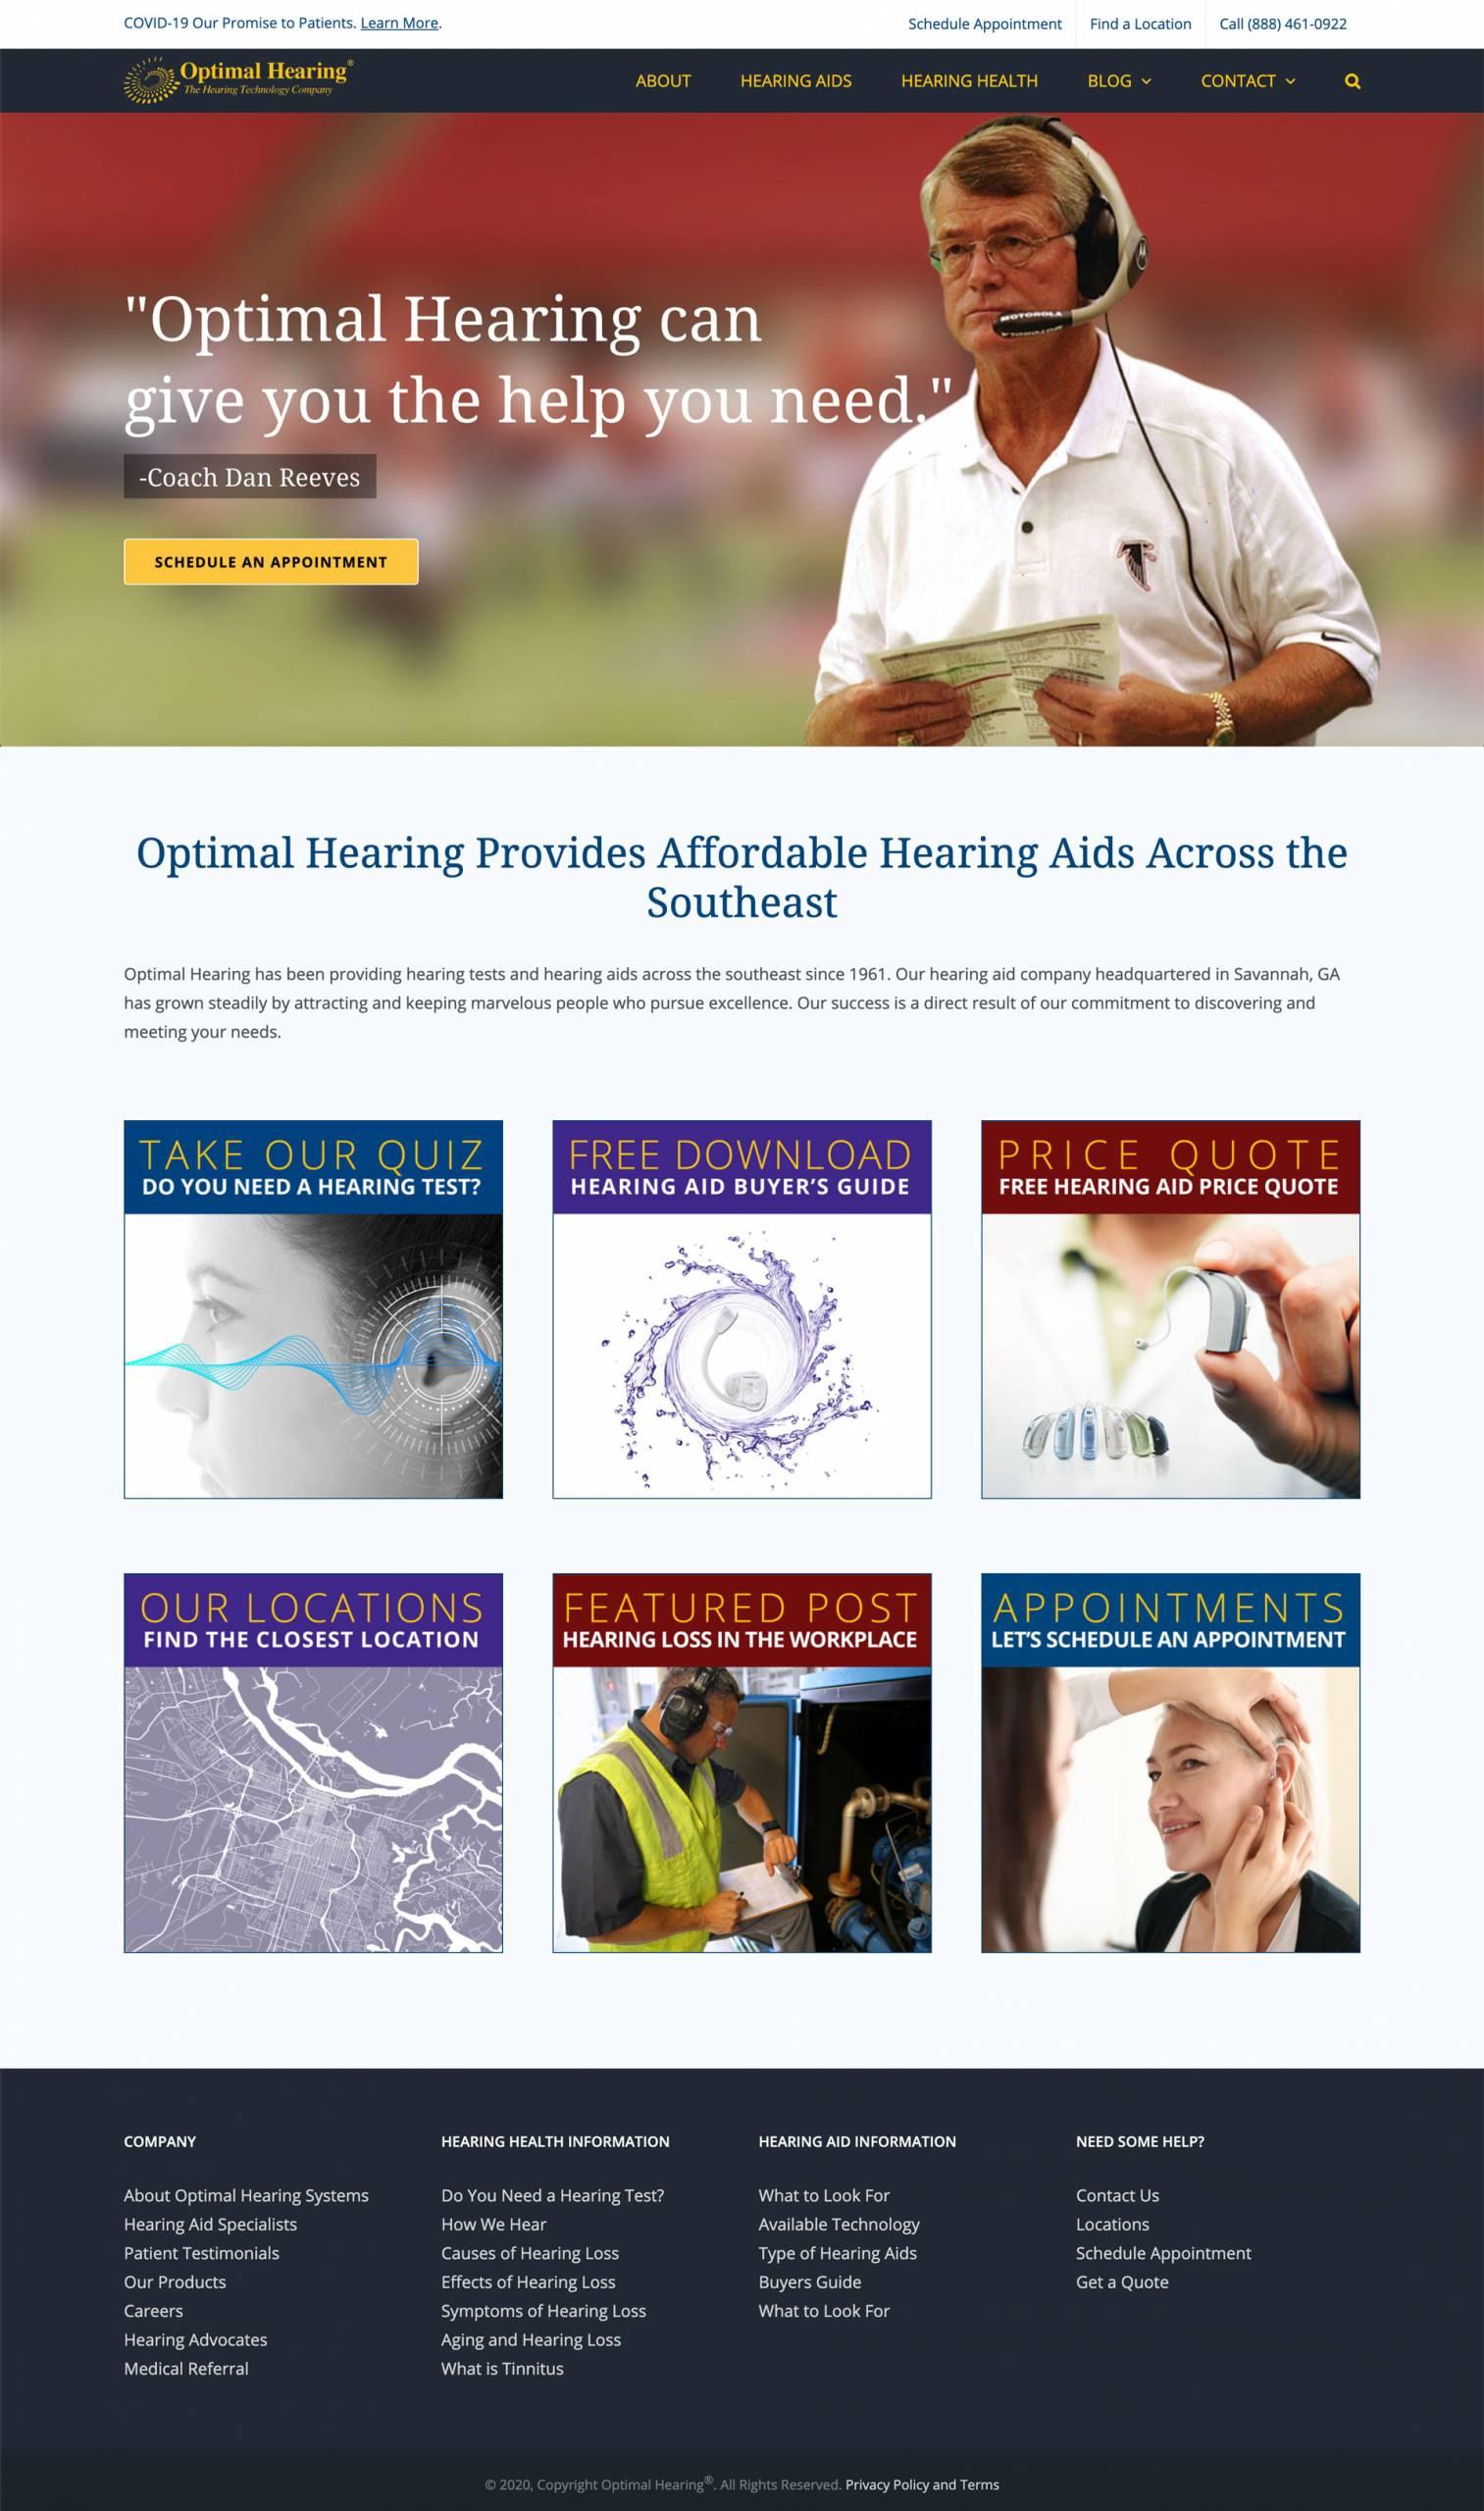 Optimal Hearing Healthcare Website Design